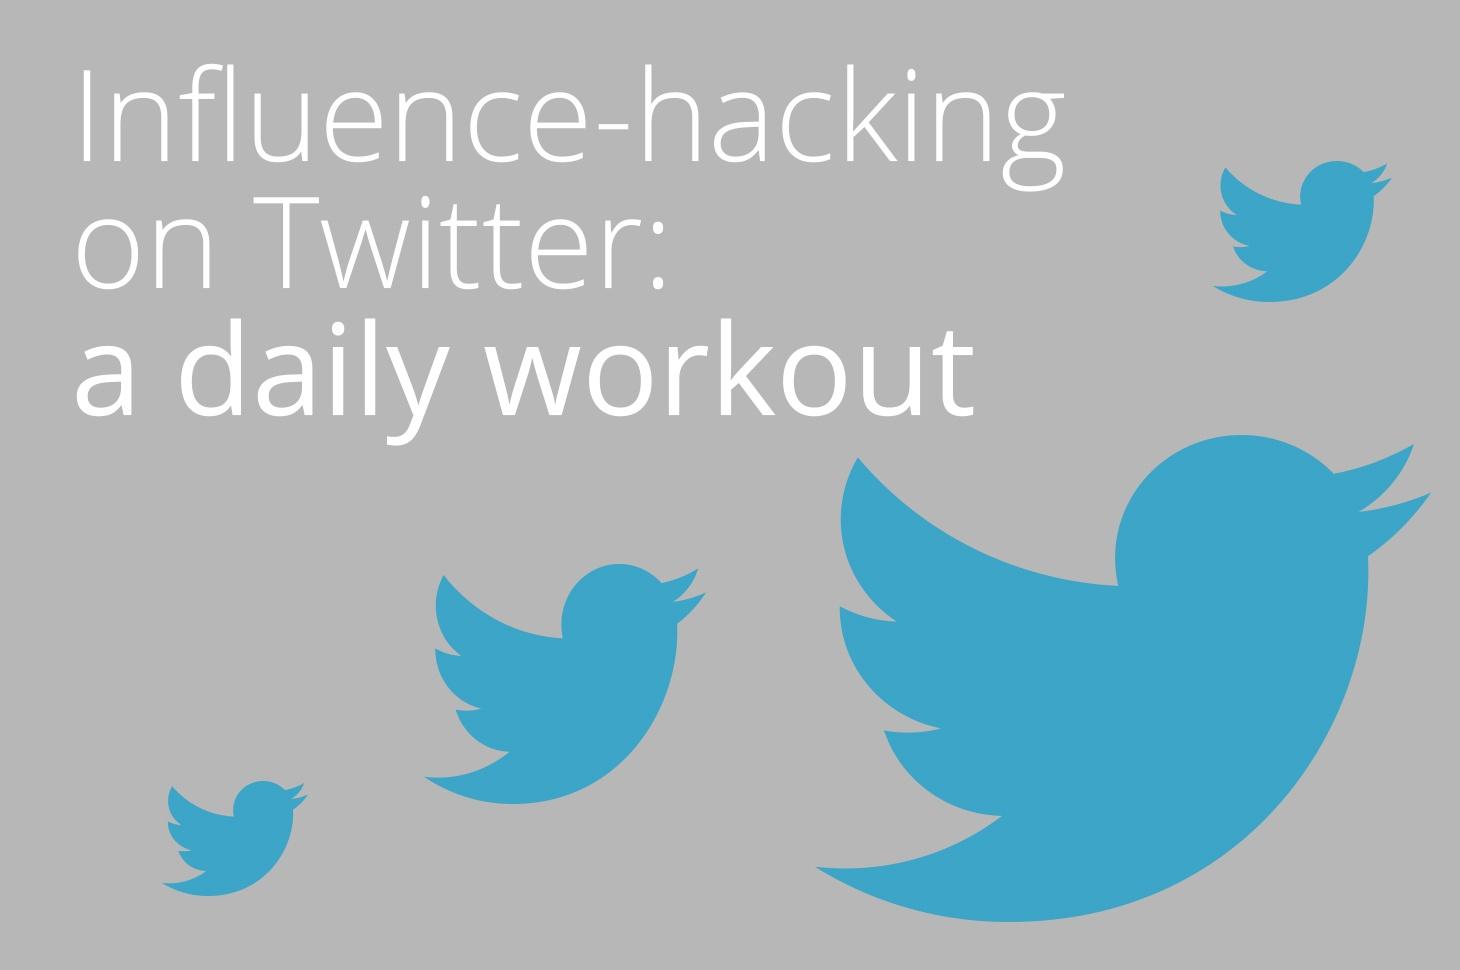 InfluenceHackingTwitter.jpg